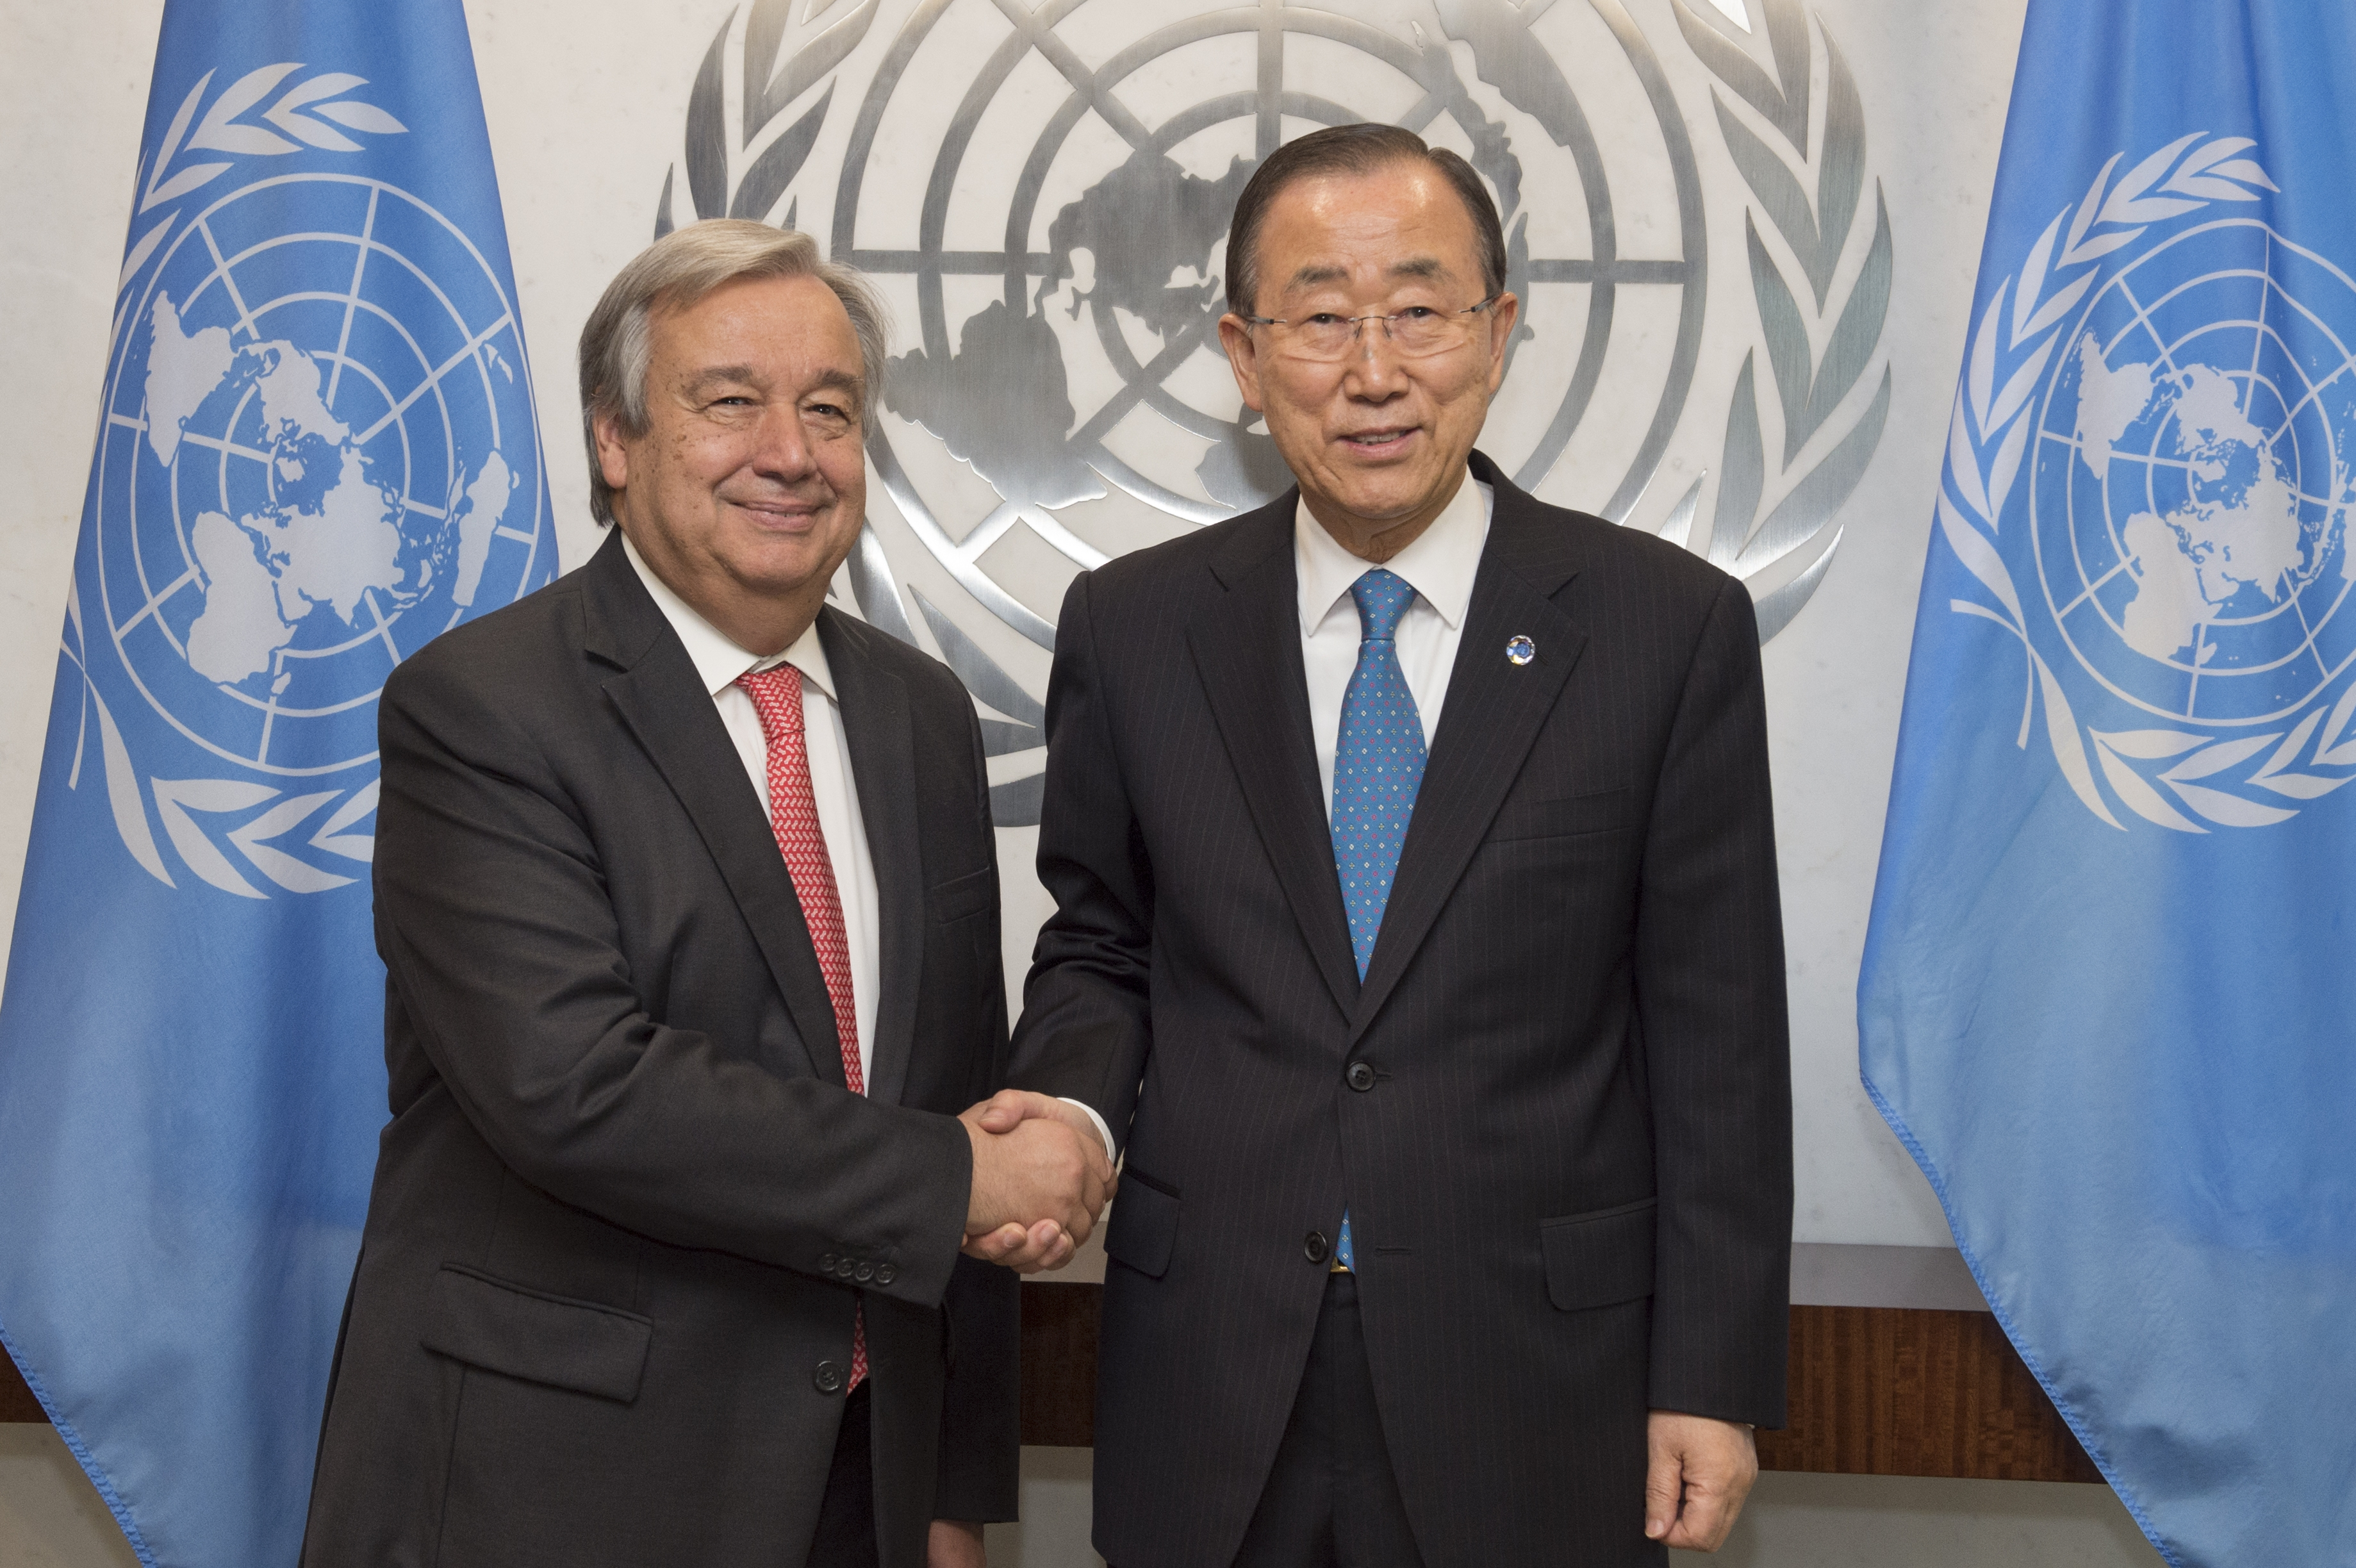 FNs generalsekretær António Guterres har forsøkt åreformere FN helt siden han ble innsatt som generalsekretær i januar 2017. Bildet viser Guterres (t.v.) sammen med den forrige generalsekretæren i FN, Ban Ki-moon. Foto: UN Photo/Eskinder Debebe